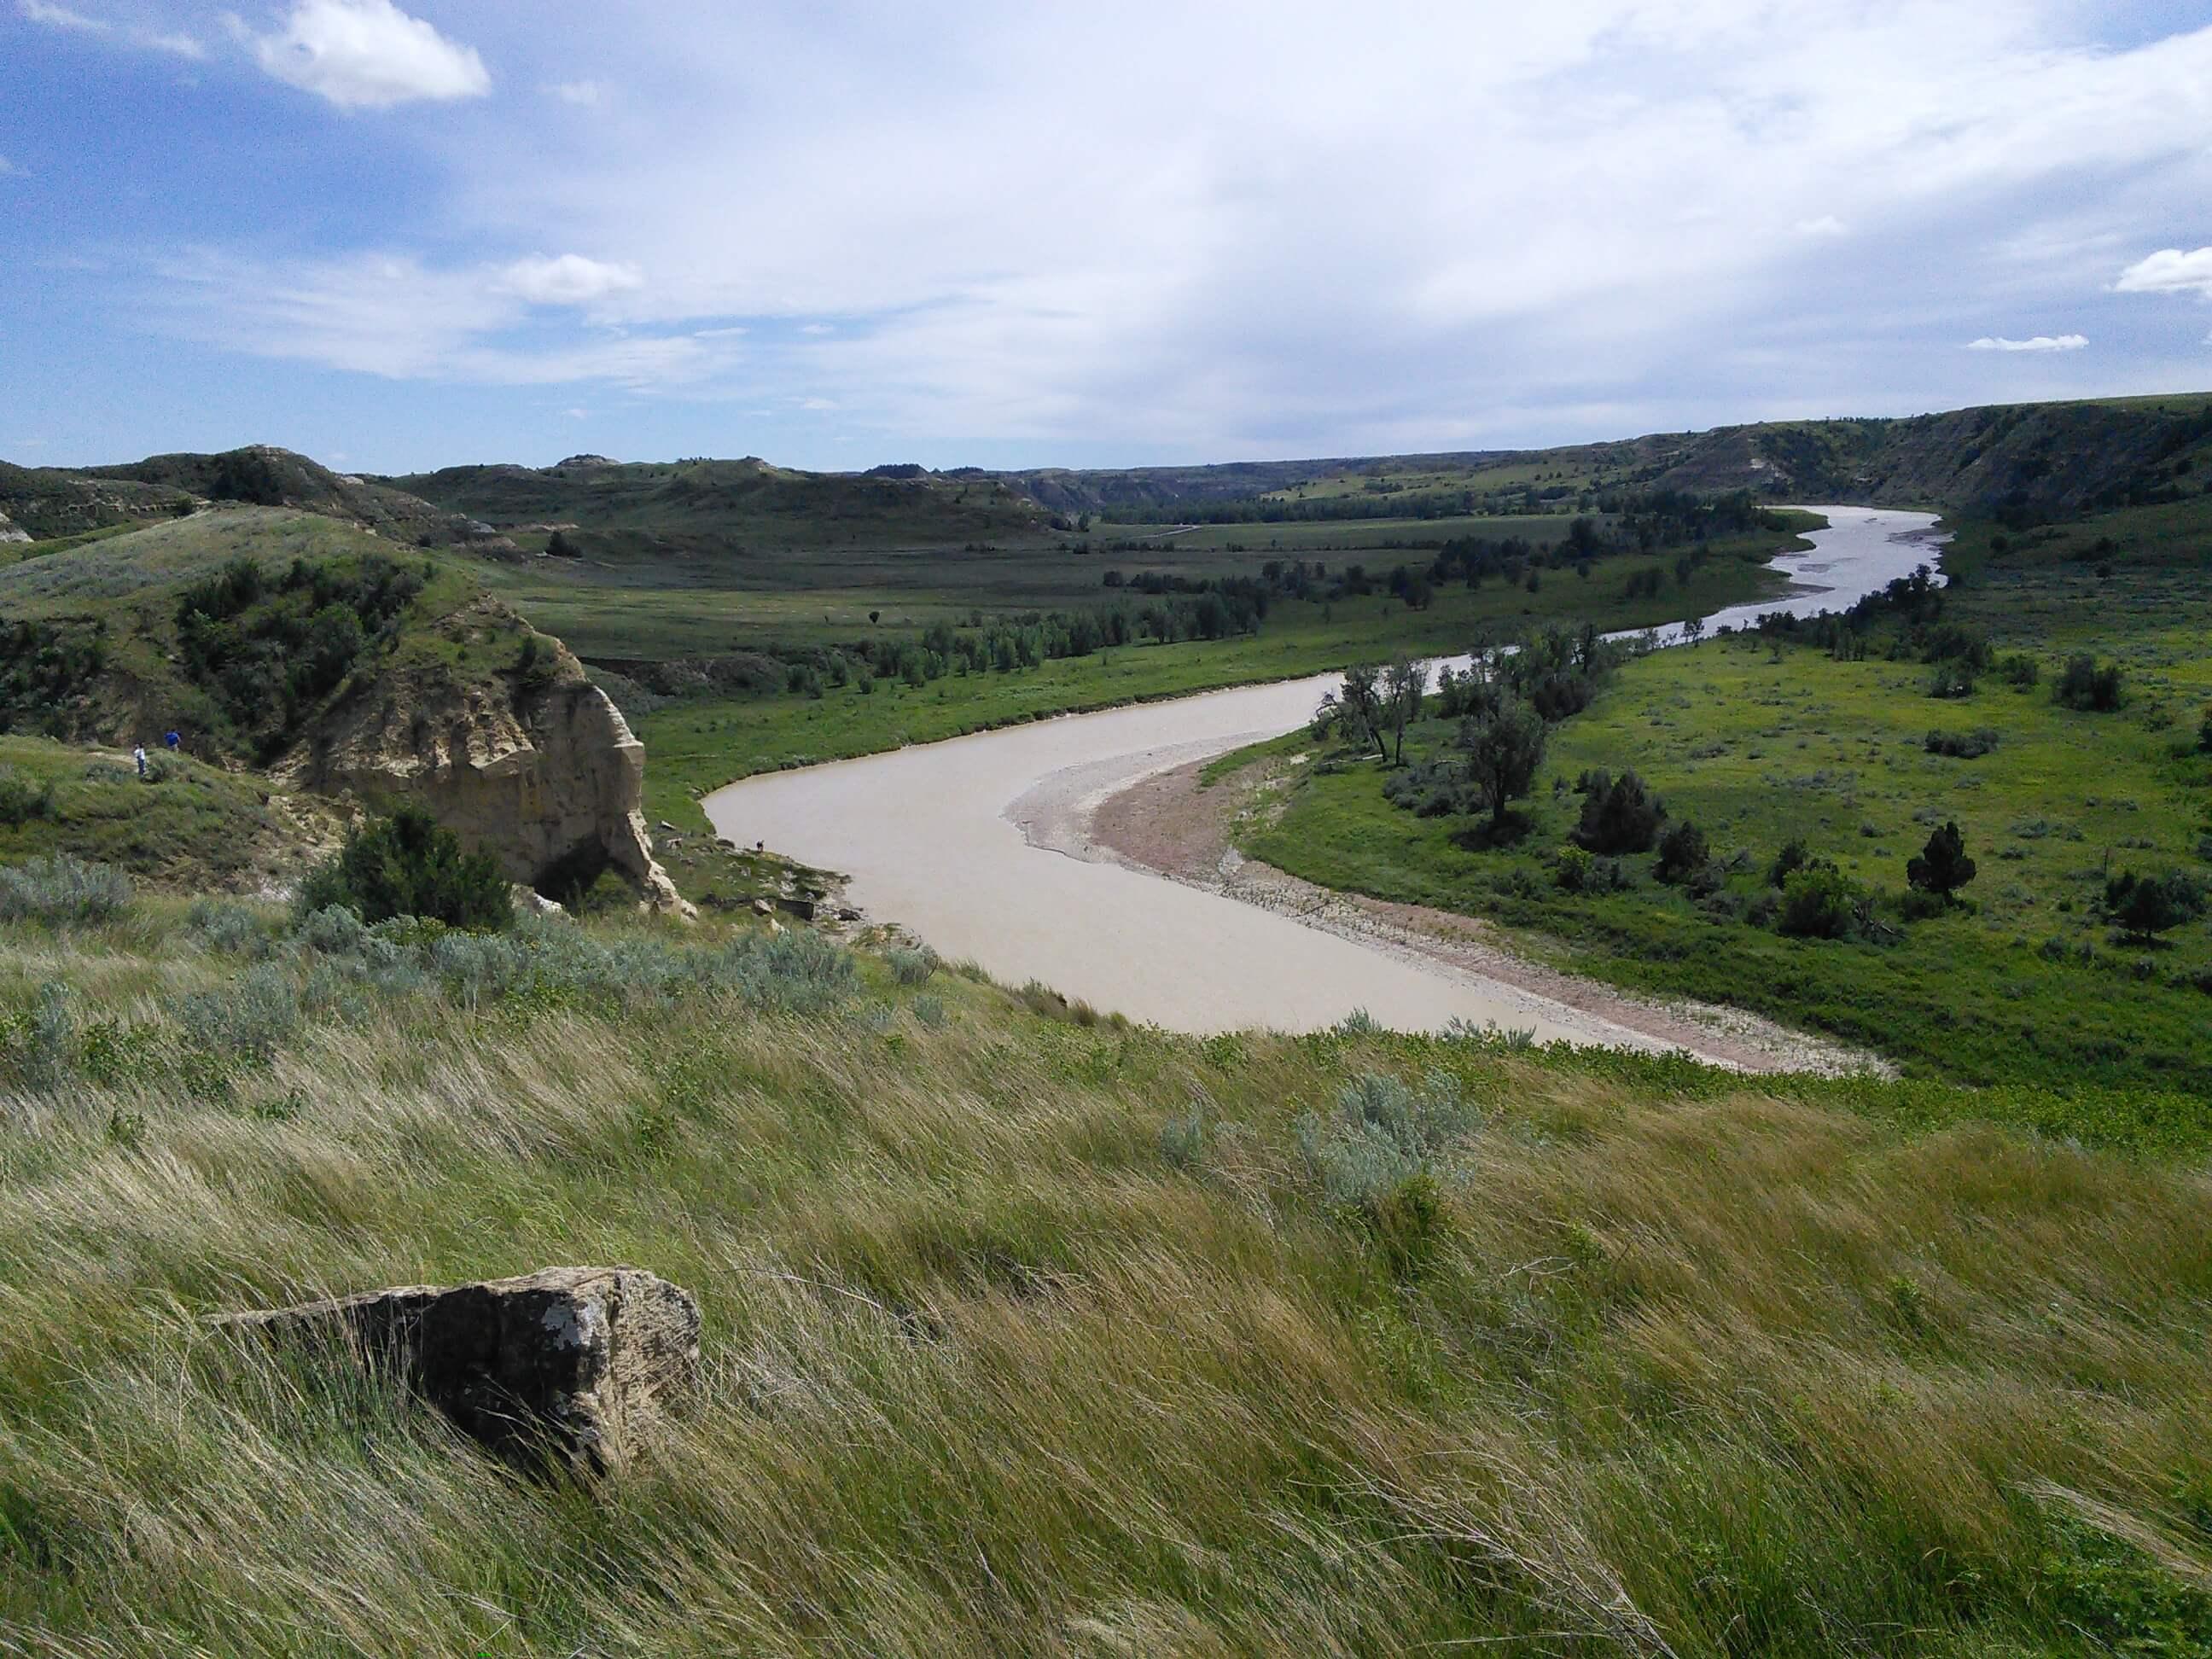 Theodore Roosevelt National Park, Medora, North Dakota